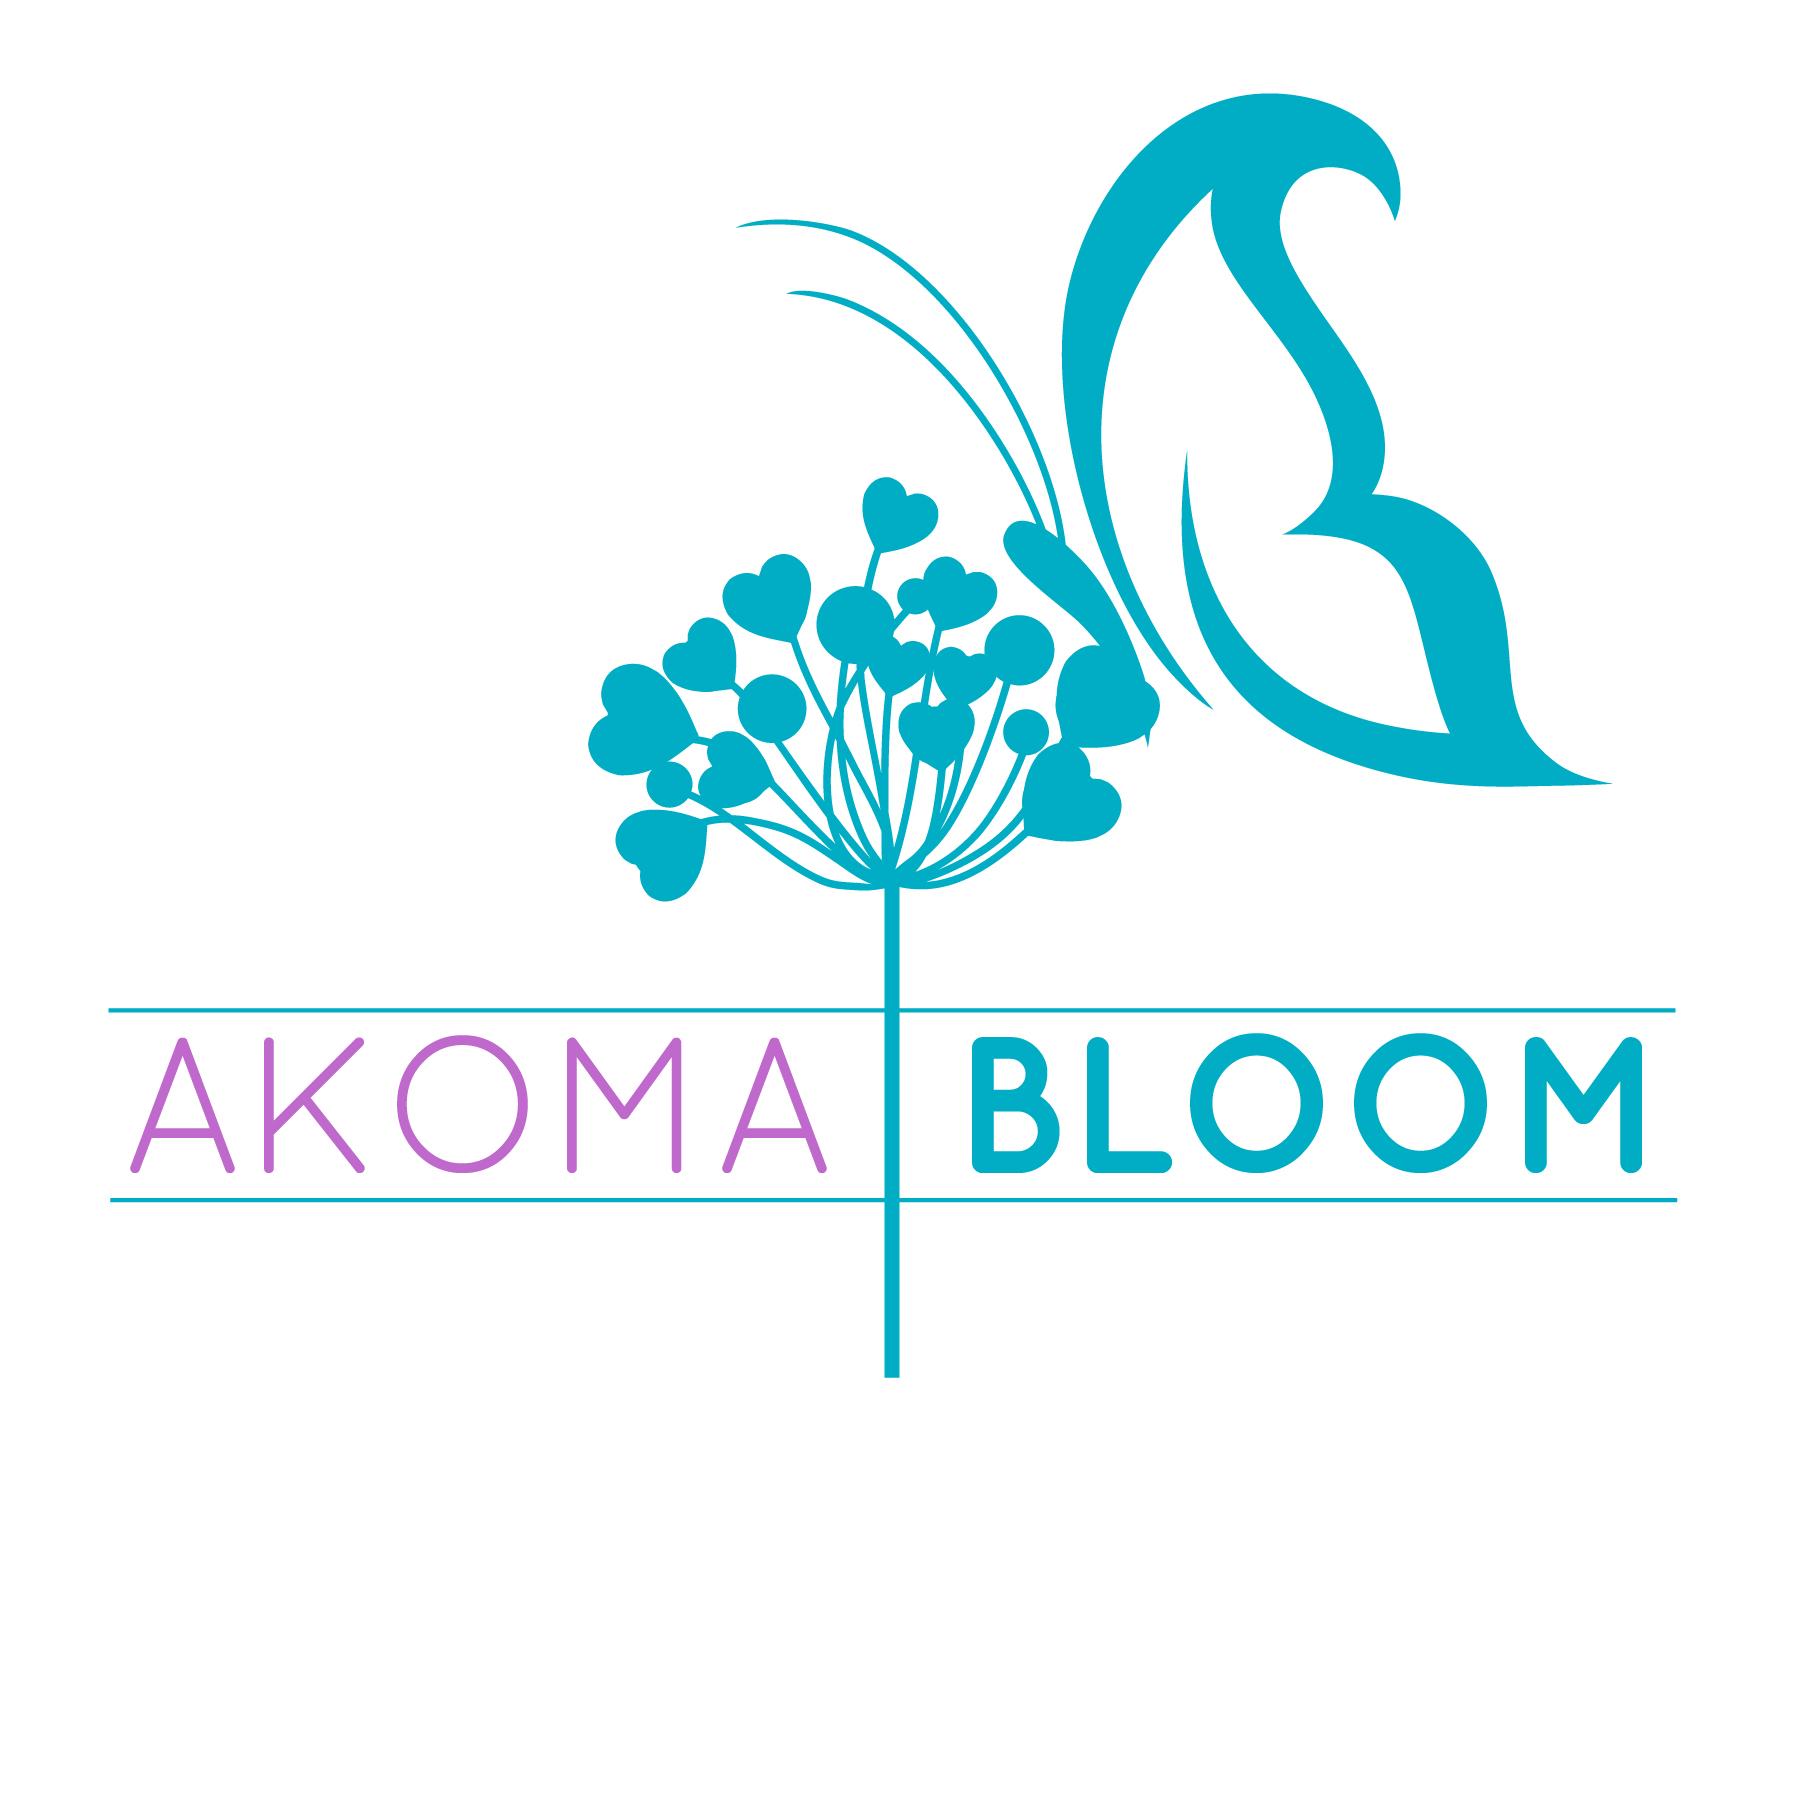 Akoma_Bloom-05.jpg